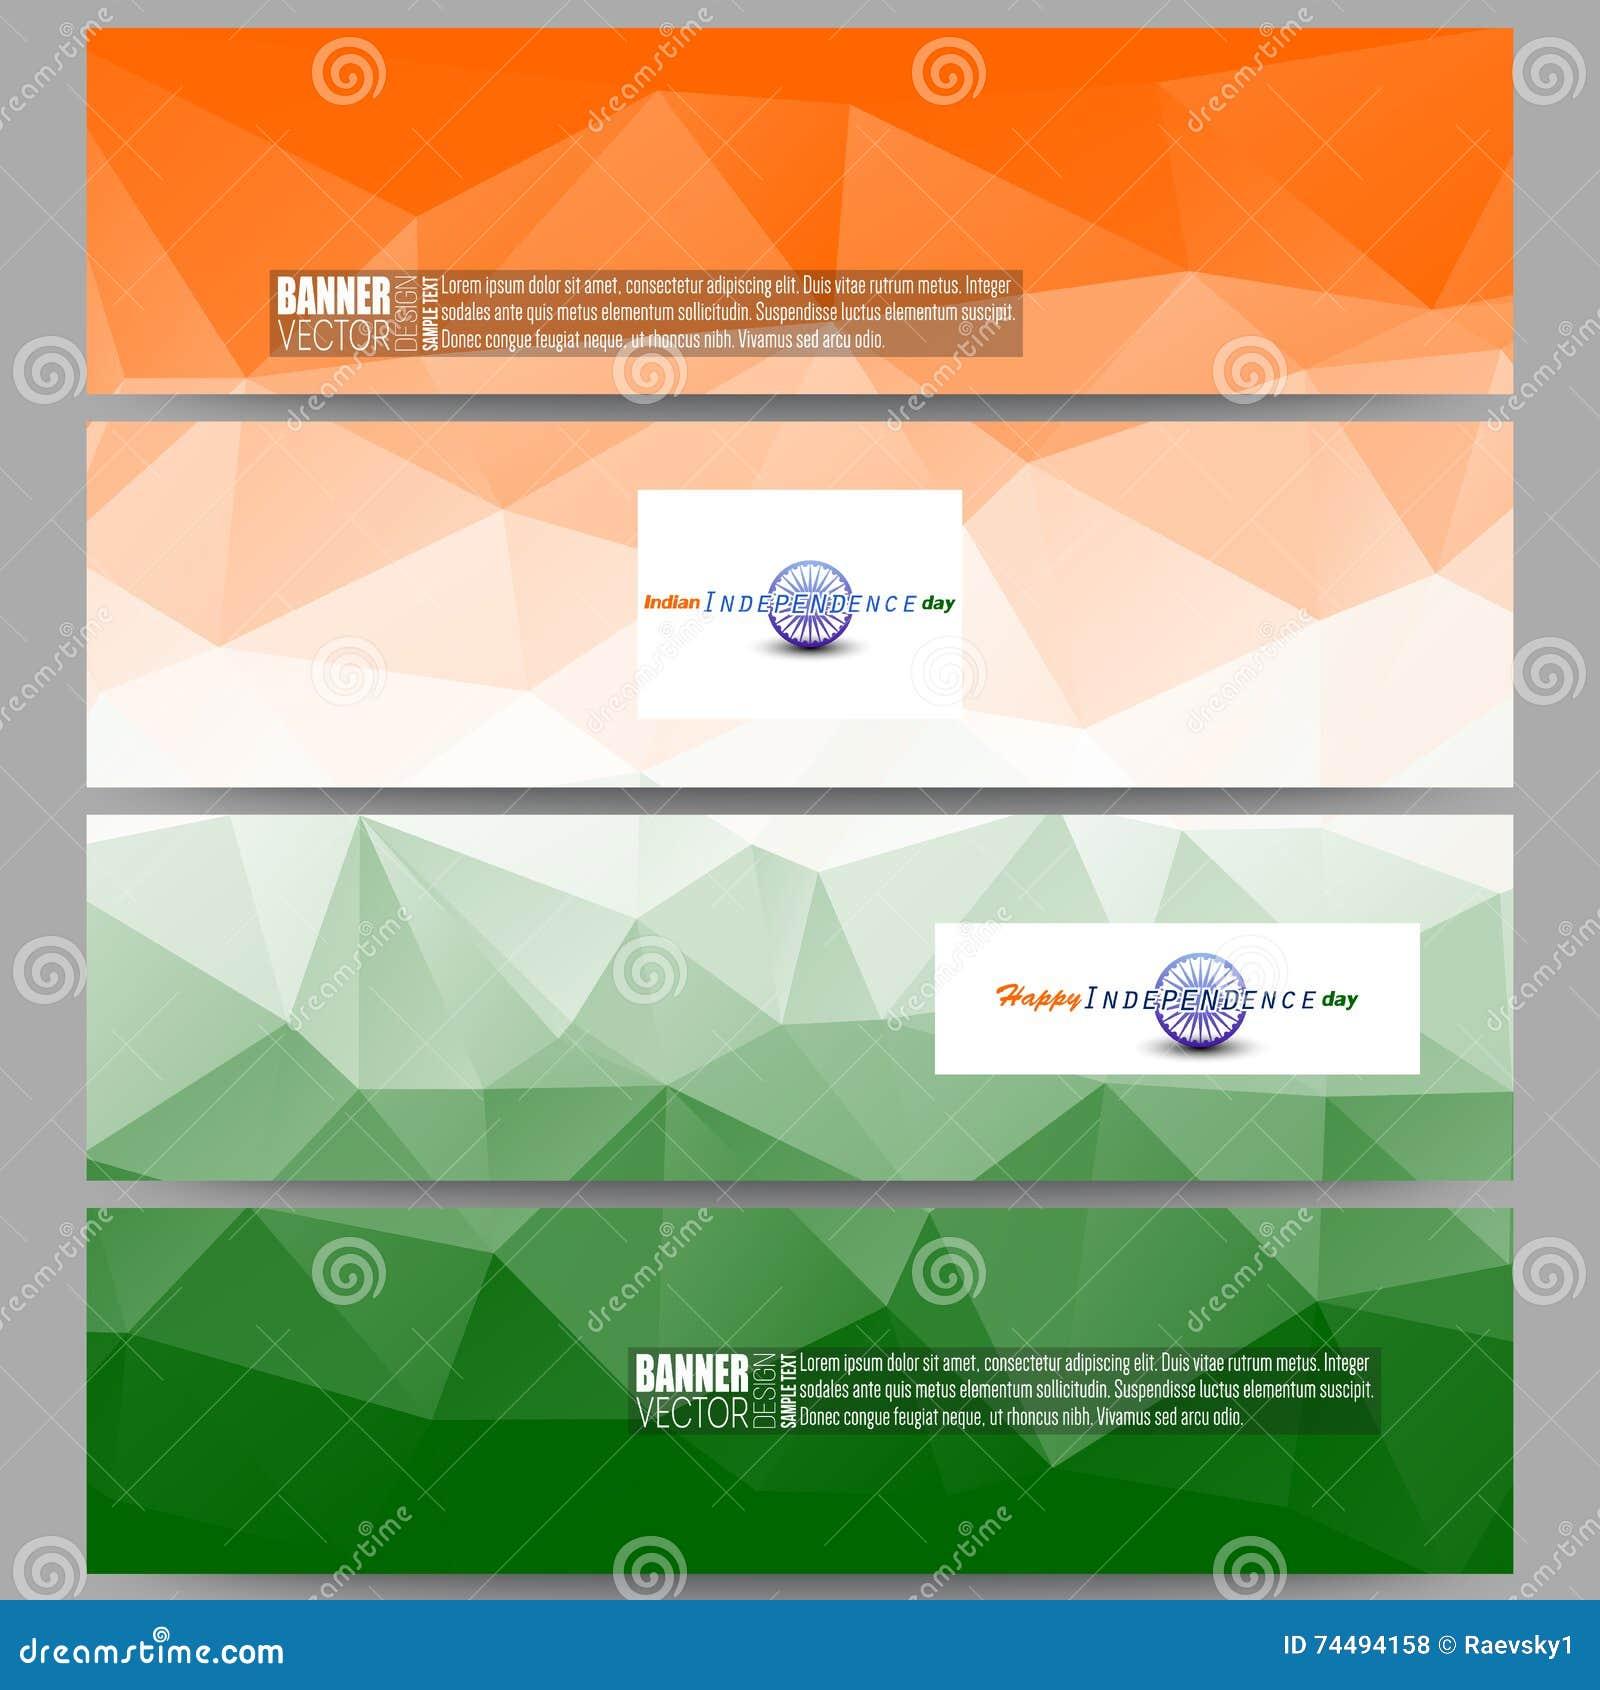 Colors website ashoka - Background For Happy Indian Independence Day Celebration With Ashoka Wheel And National Flag